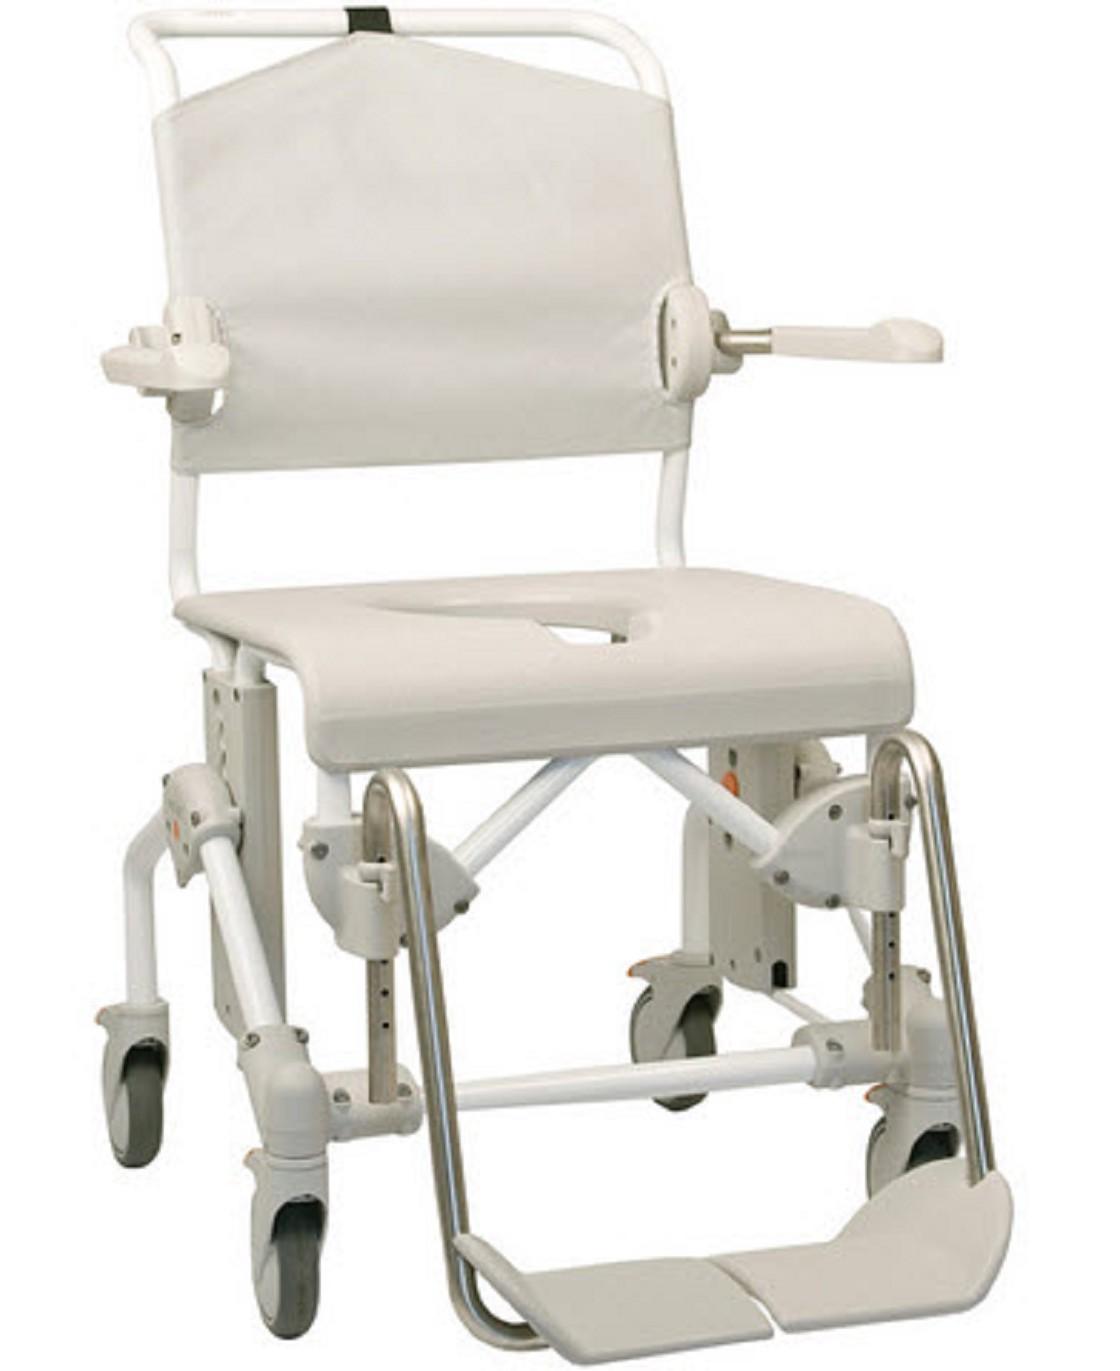 Mesh shower chairs - Etac Swift Mobile Shower Chair